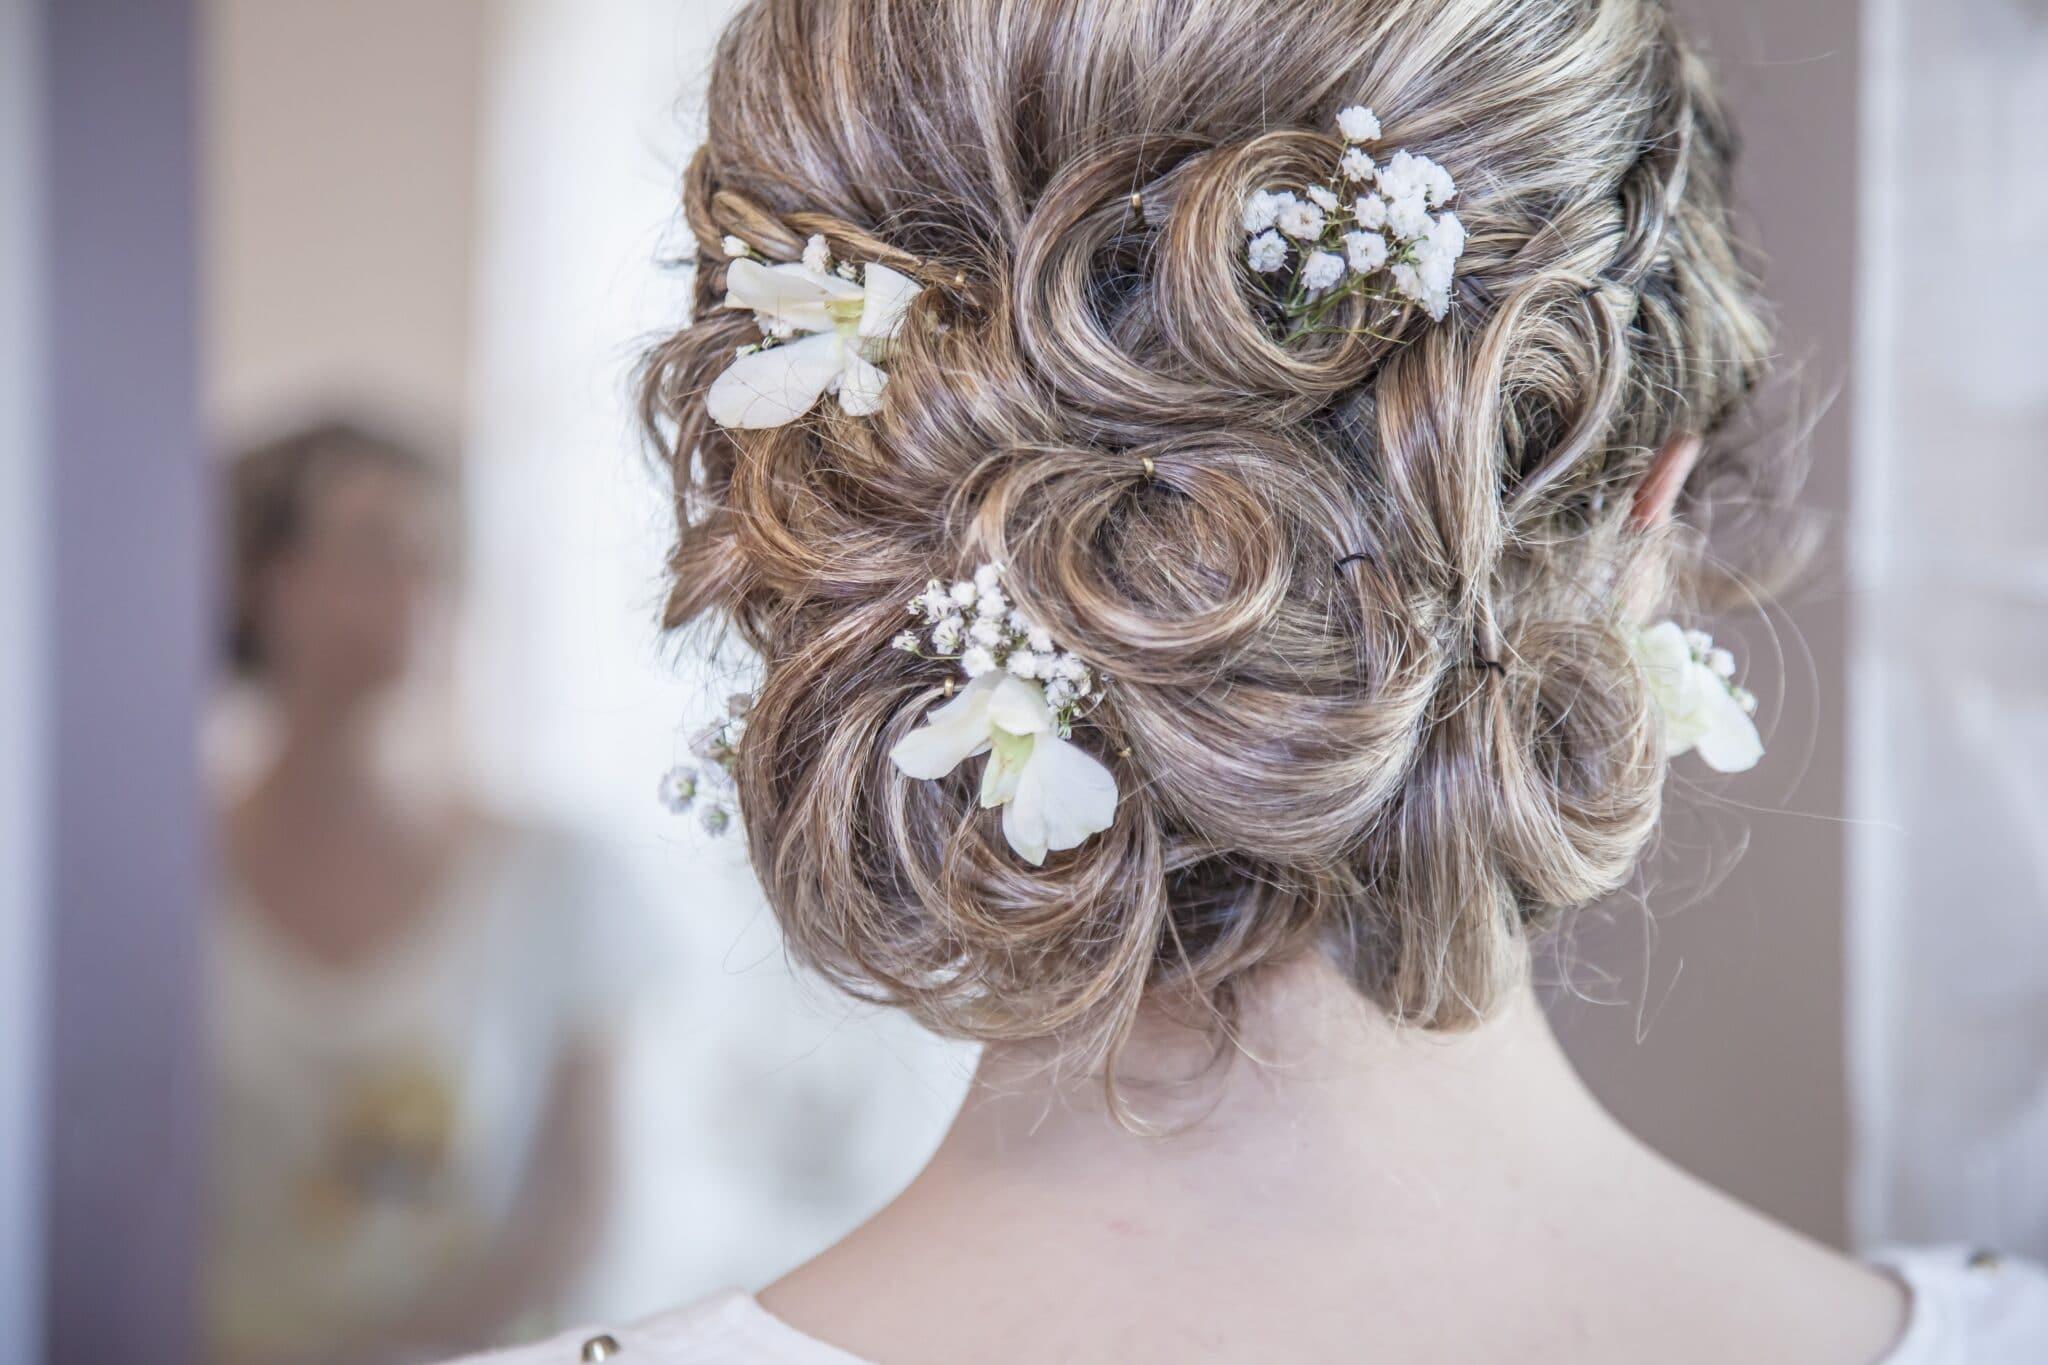 wedding hairstyle kenosha, kenosha wedding hairstylist, wedding updo in kenosha